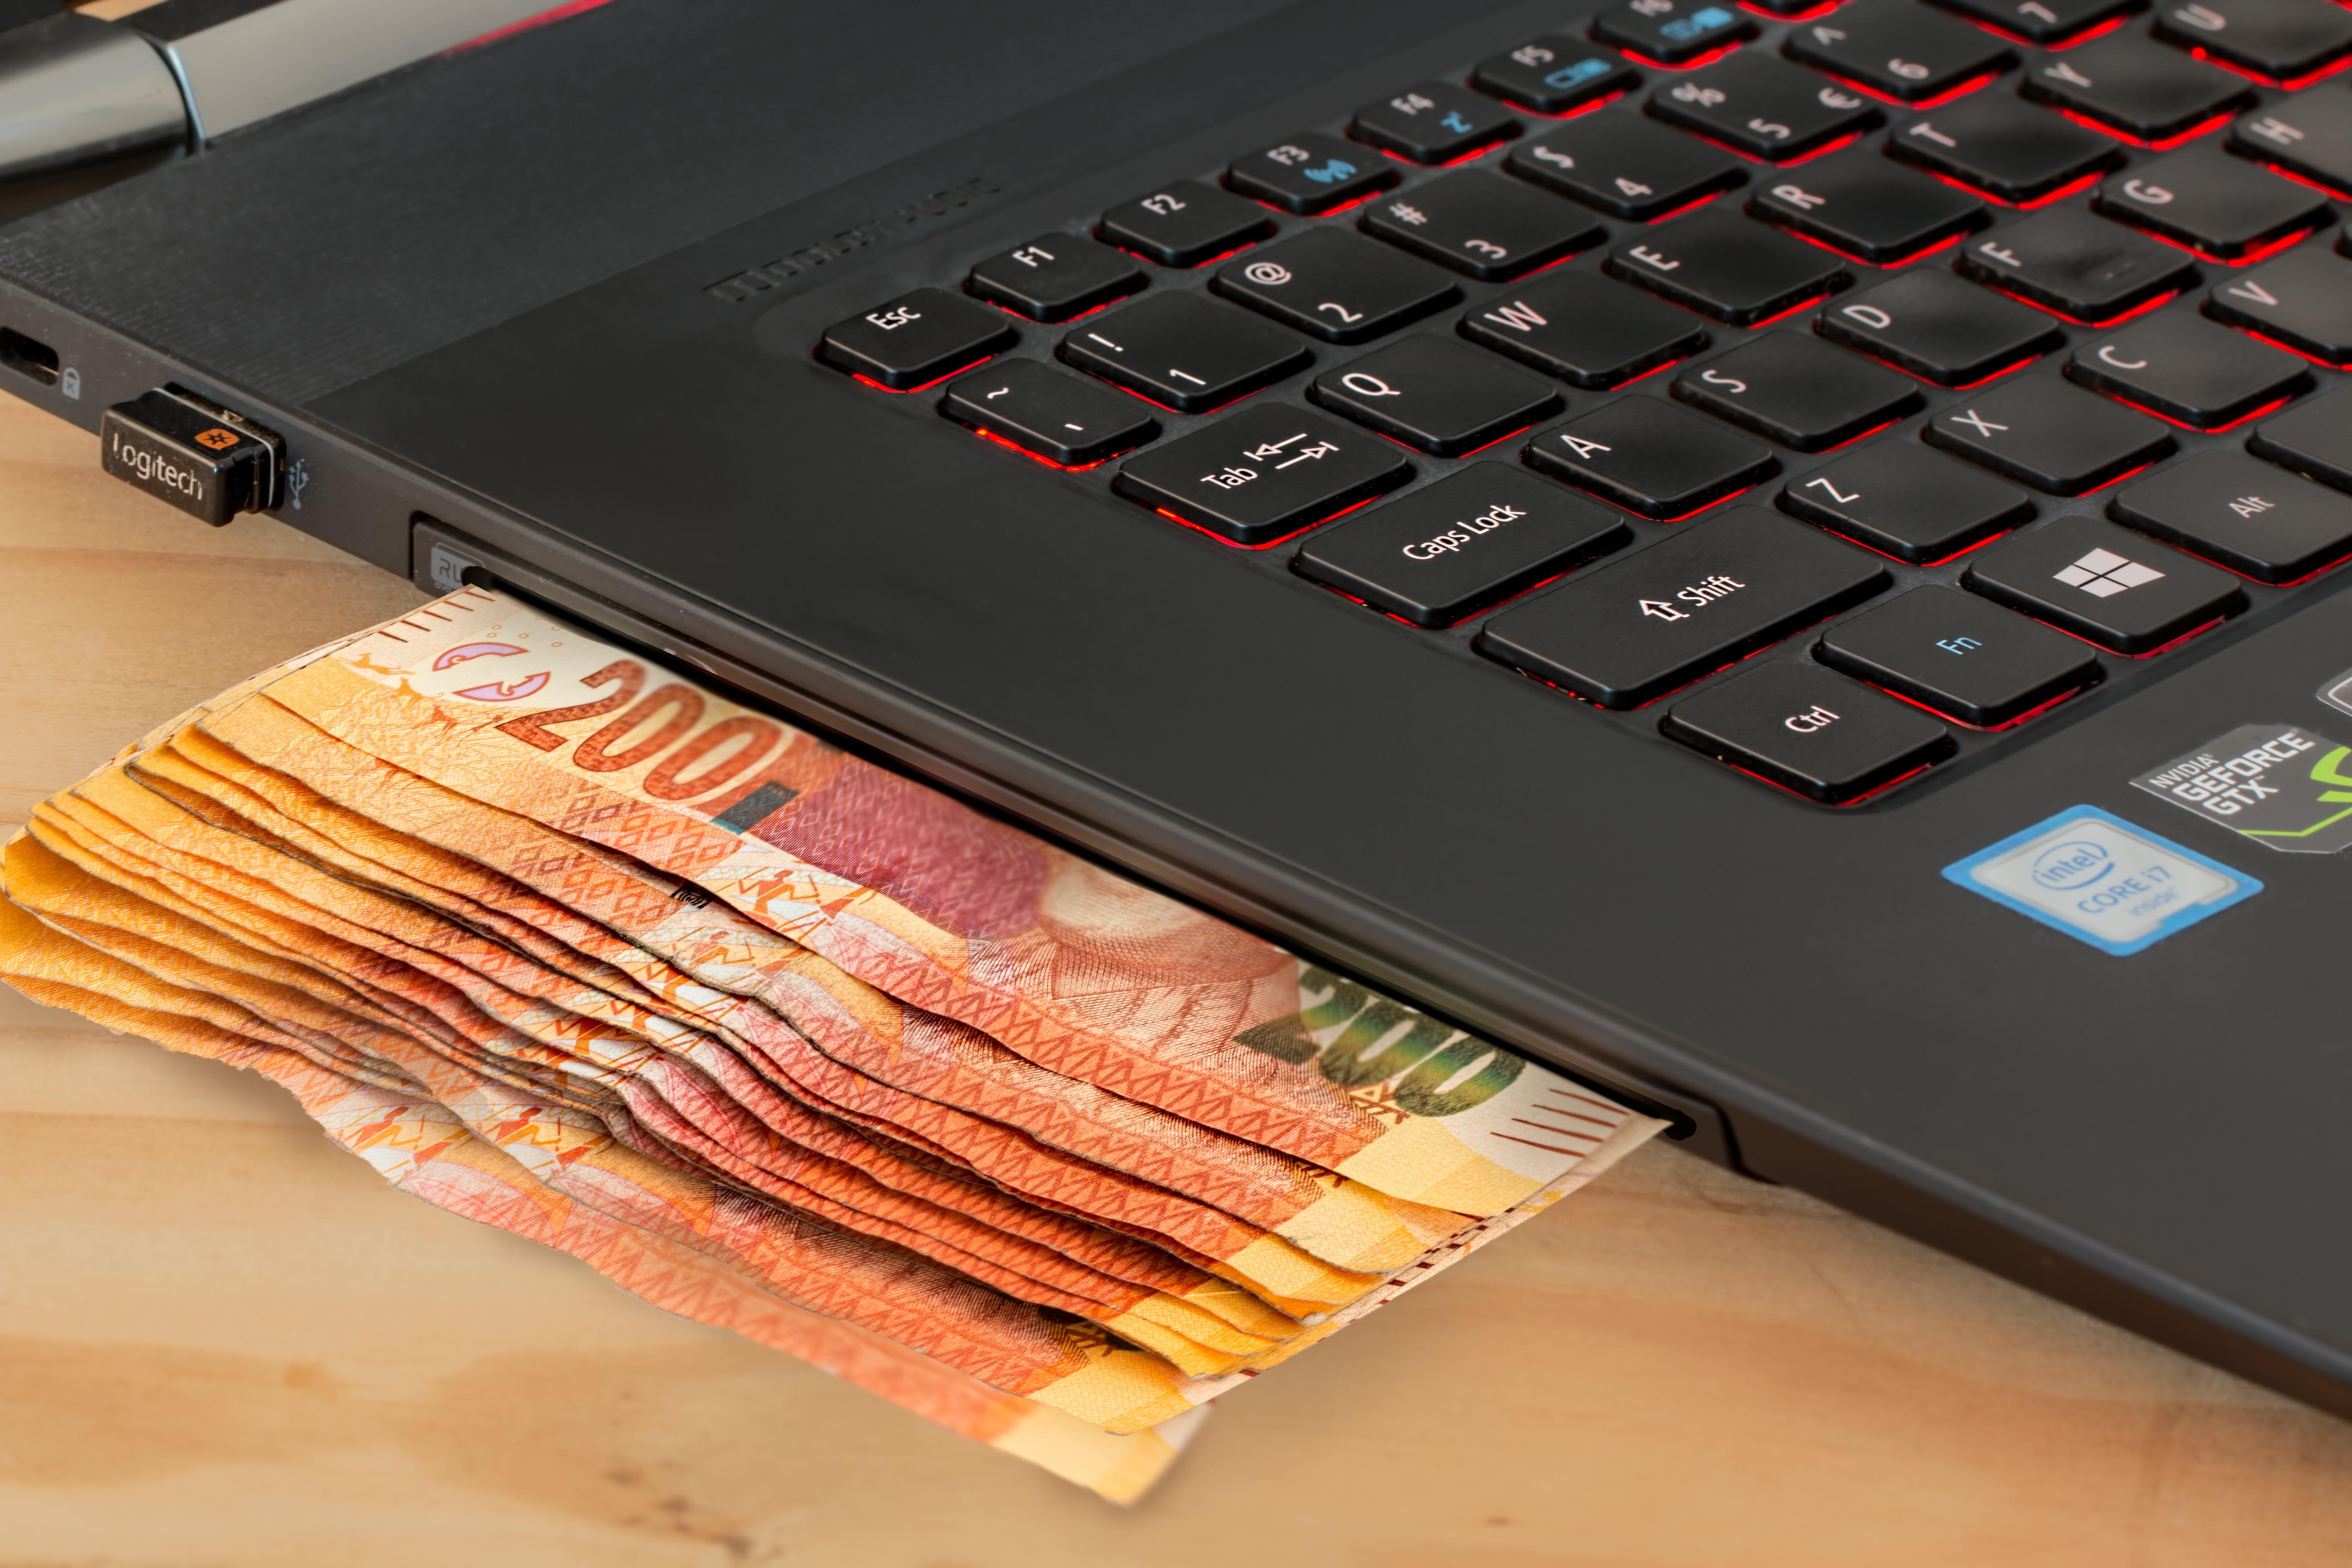 Top 5 Best Paid Online Survey Sites of 2020